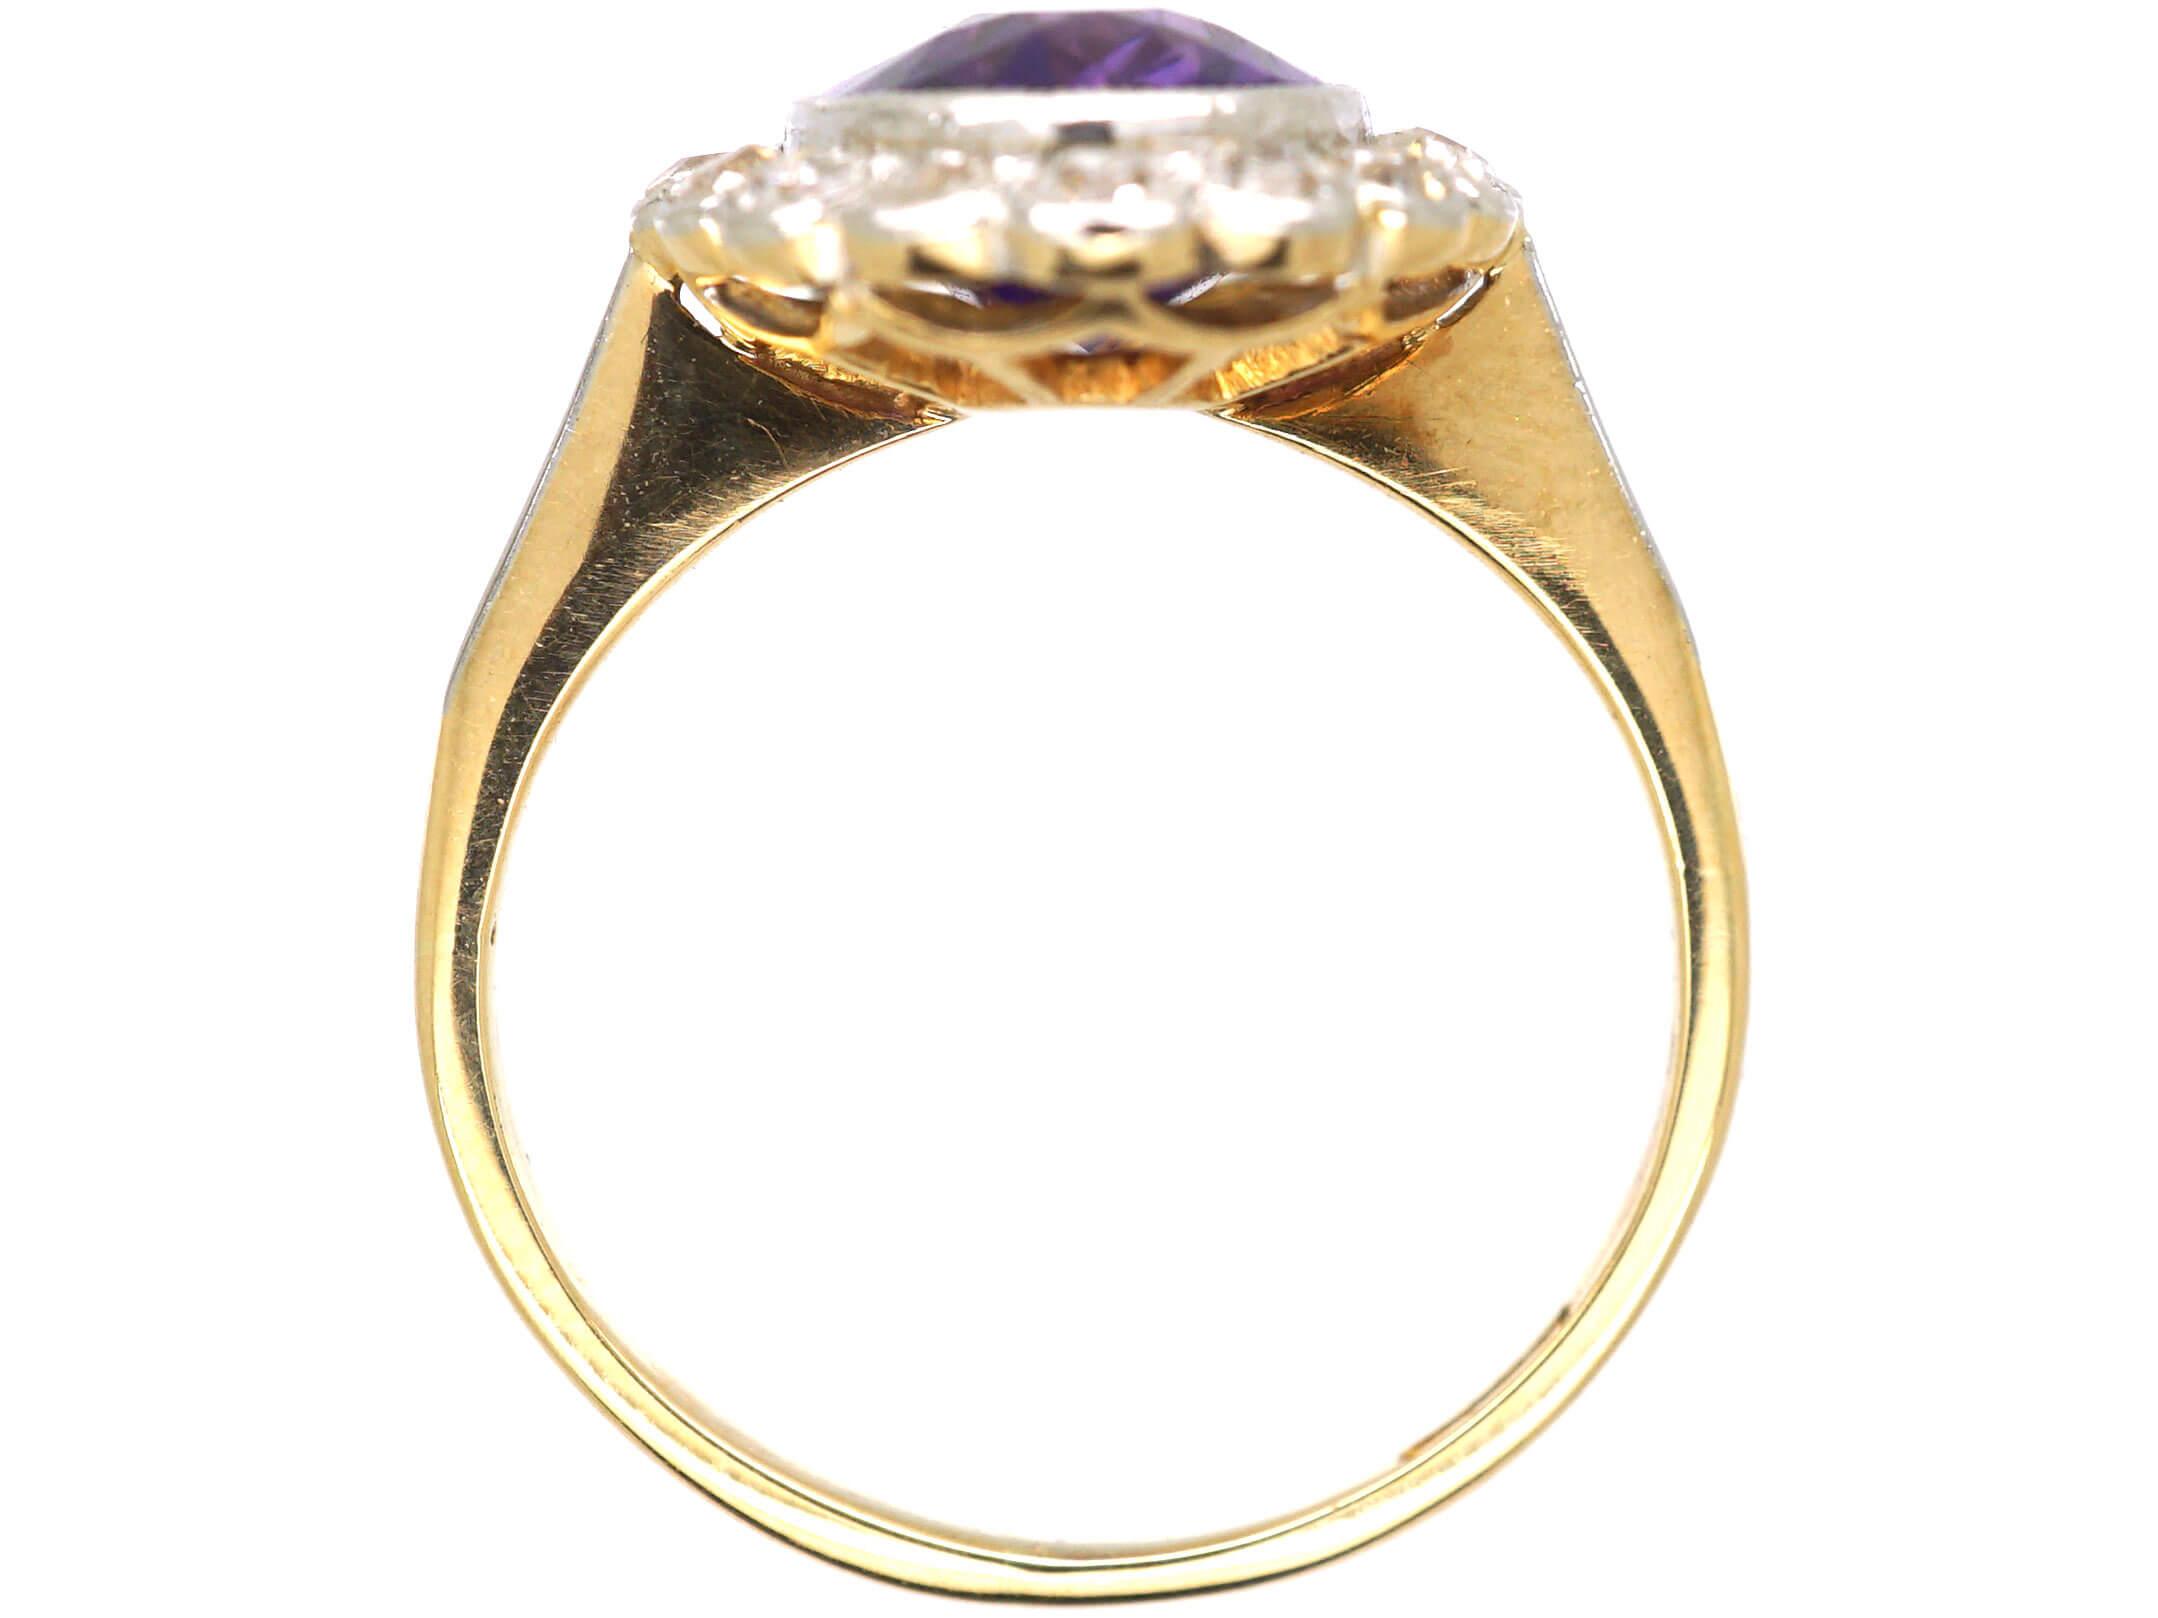 Edwardian 18ct Gold & Platinum, Siberian Amethyst & Diamond Oval Cluster Ring